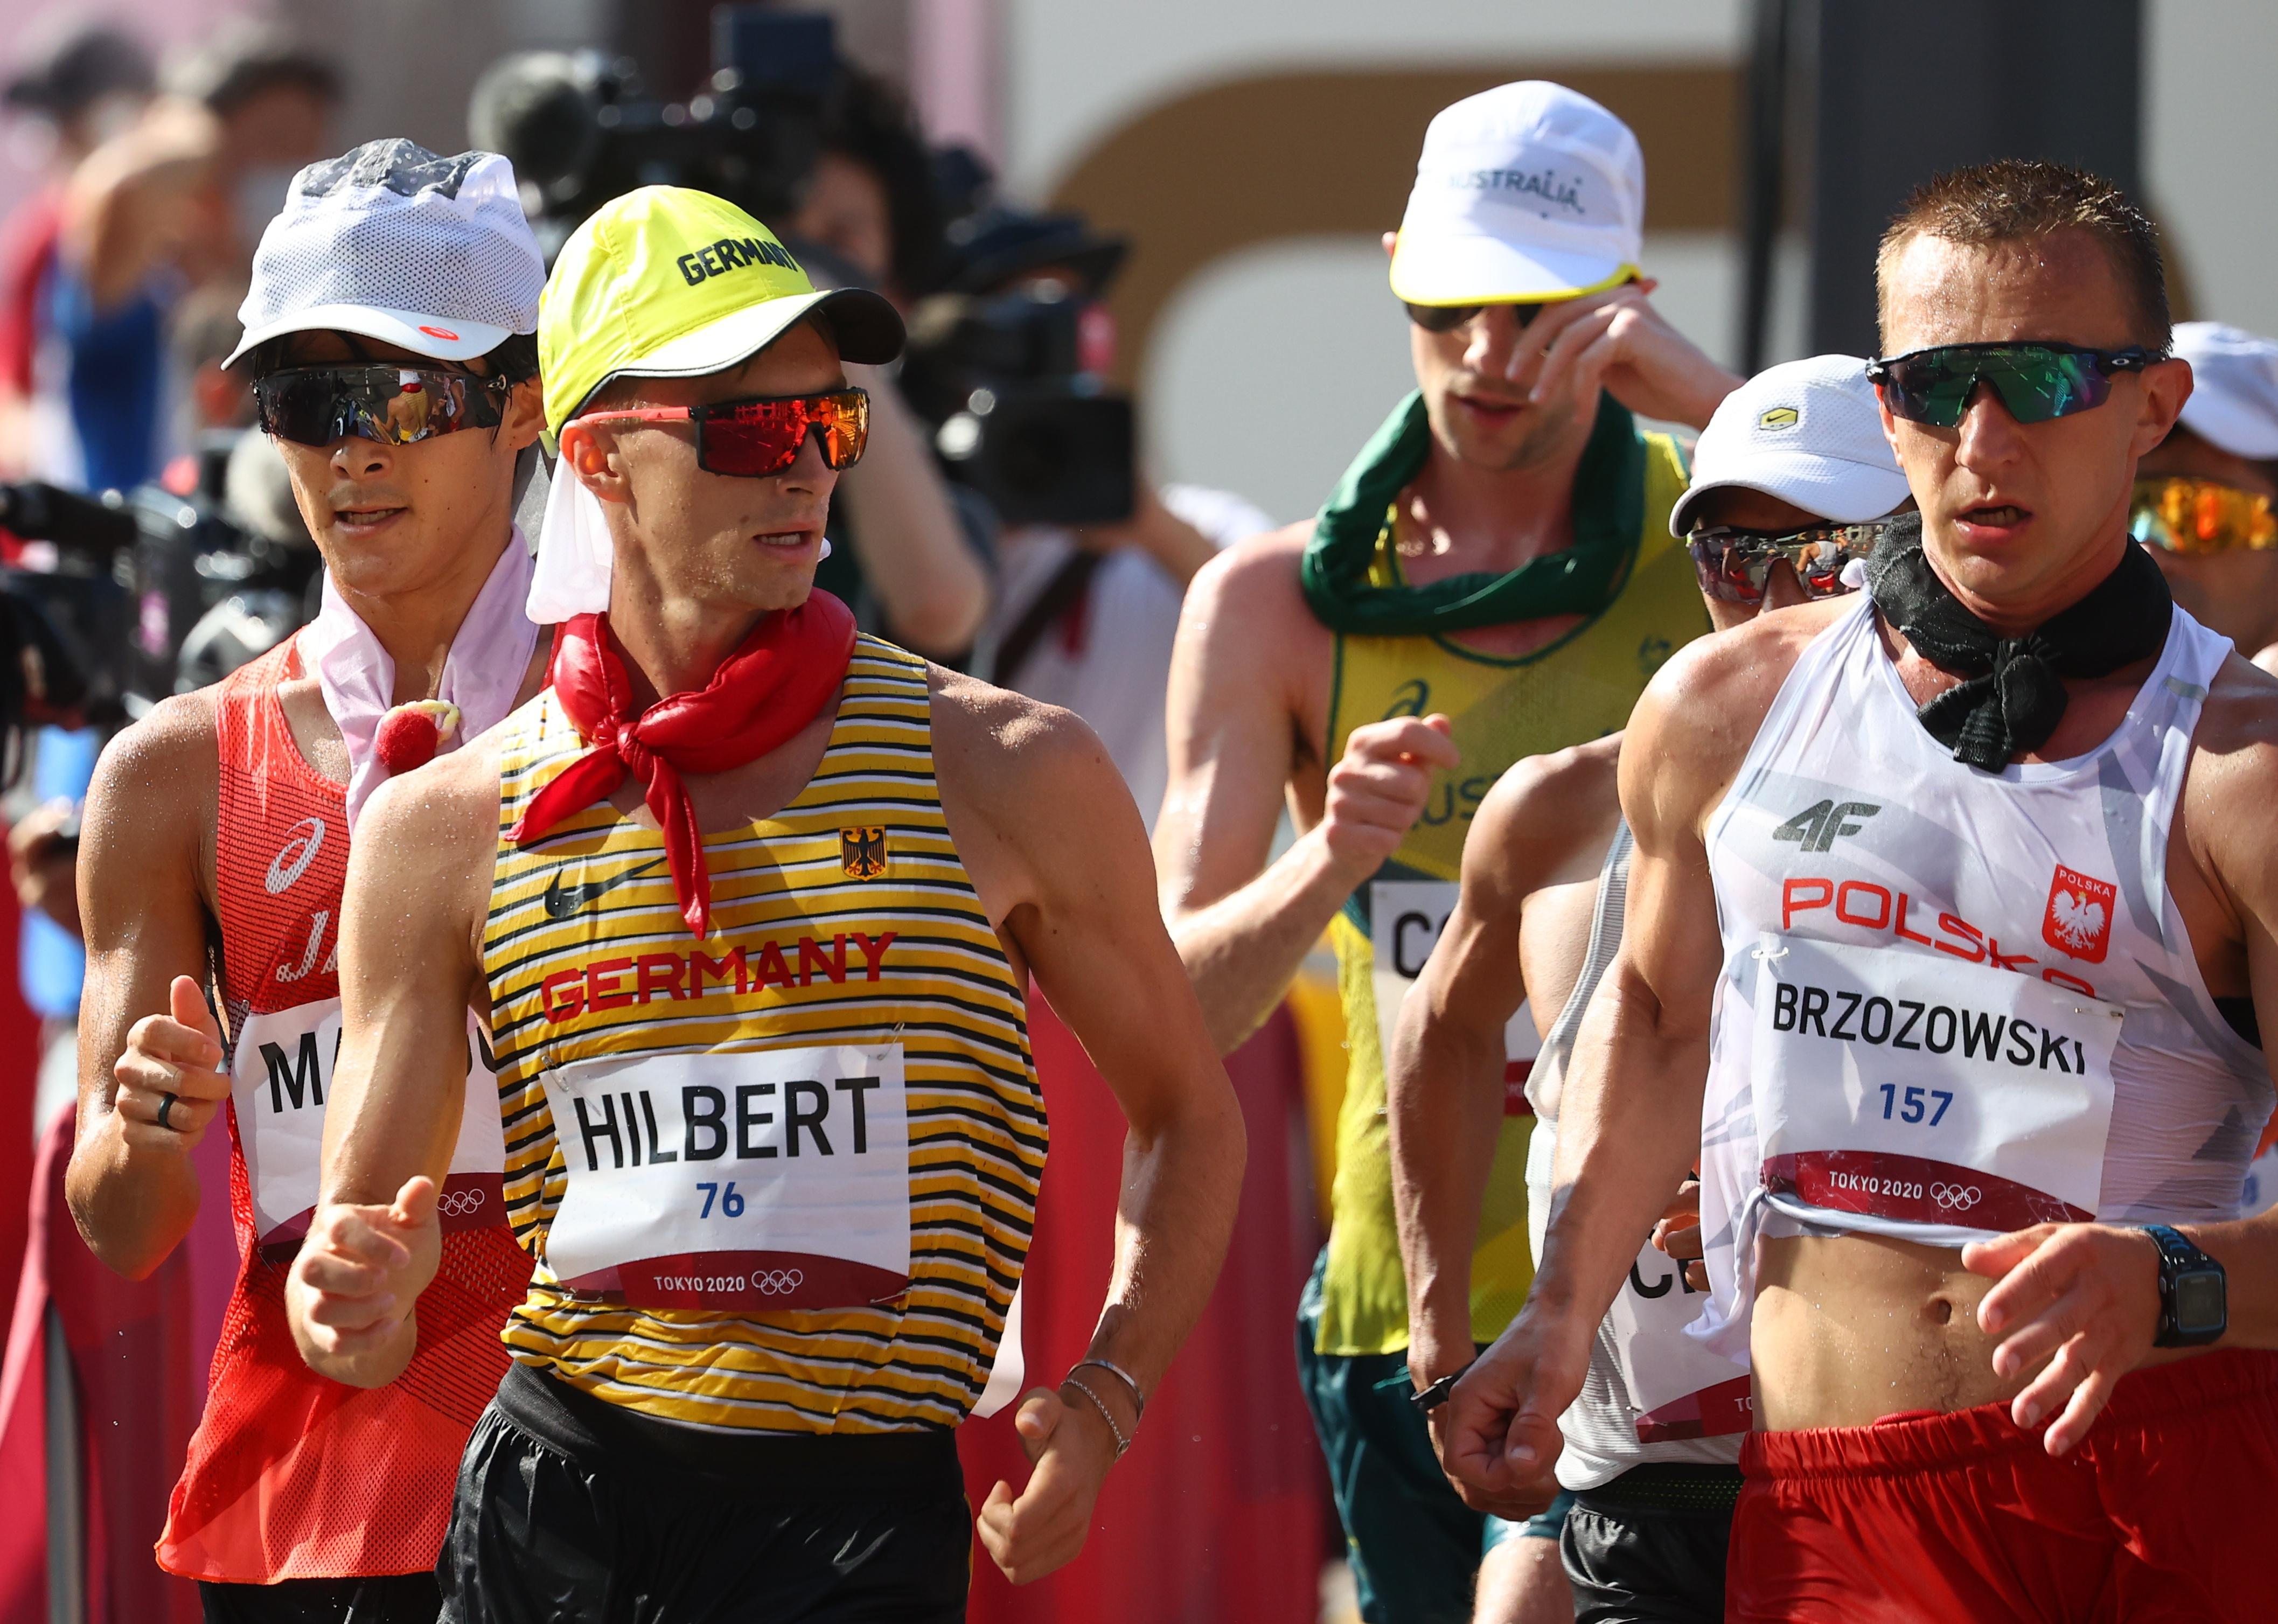 Tokyo 2020 Olympics - Athletics - Men's 50km Walk - Sapporo Odori Park, Sapporo, Japan - August 6, 2021.  Jonathan Hilbert of Germany and Artur Brzozowski of Poland in action REUTERS/Kim Hong-Ji - SP1EH851RNR16